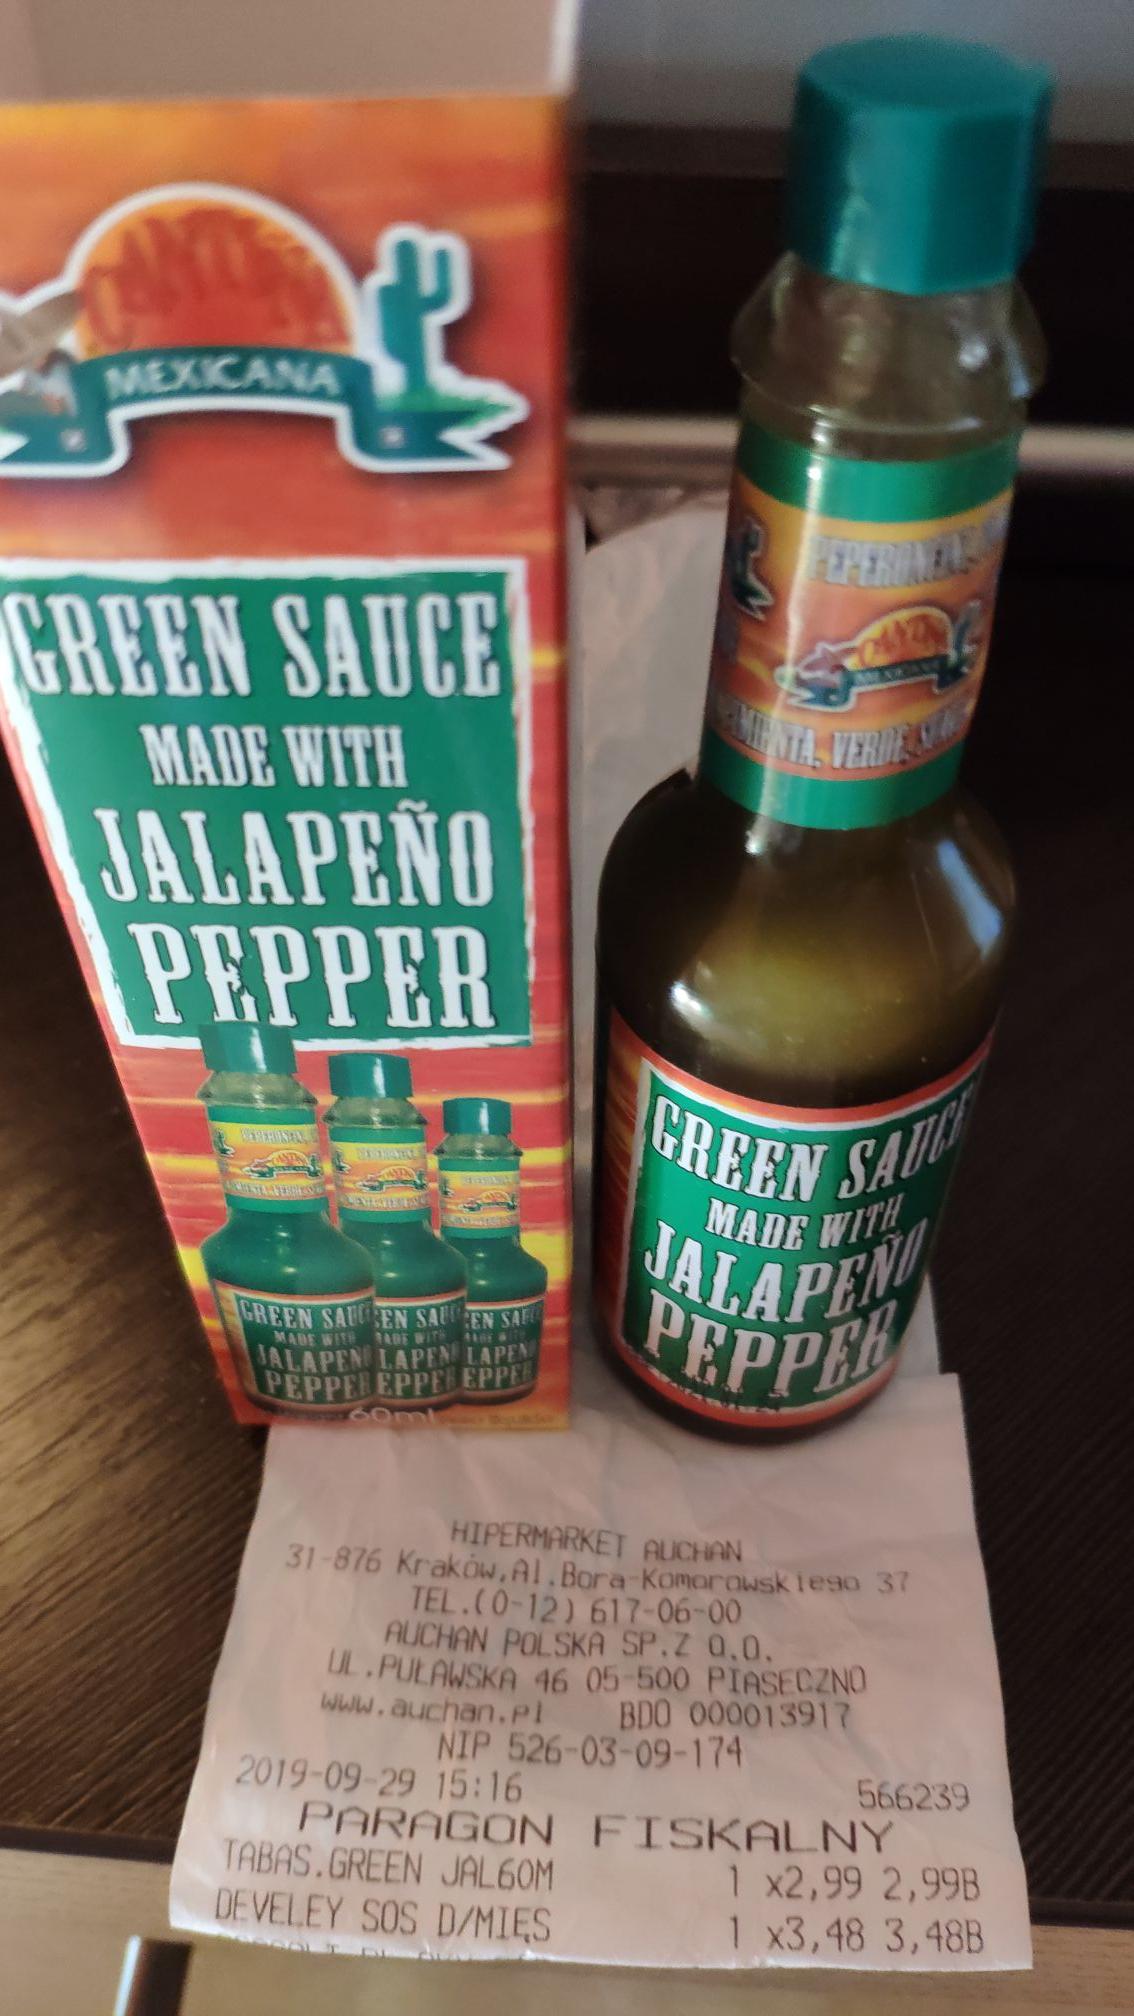 Cantina Mexicana Green Sauce @ Auchan